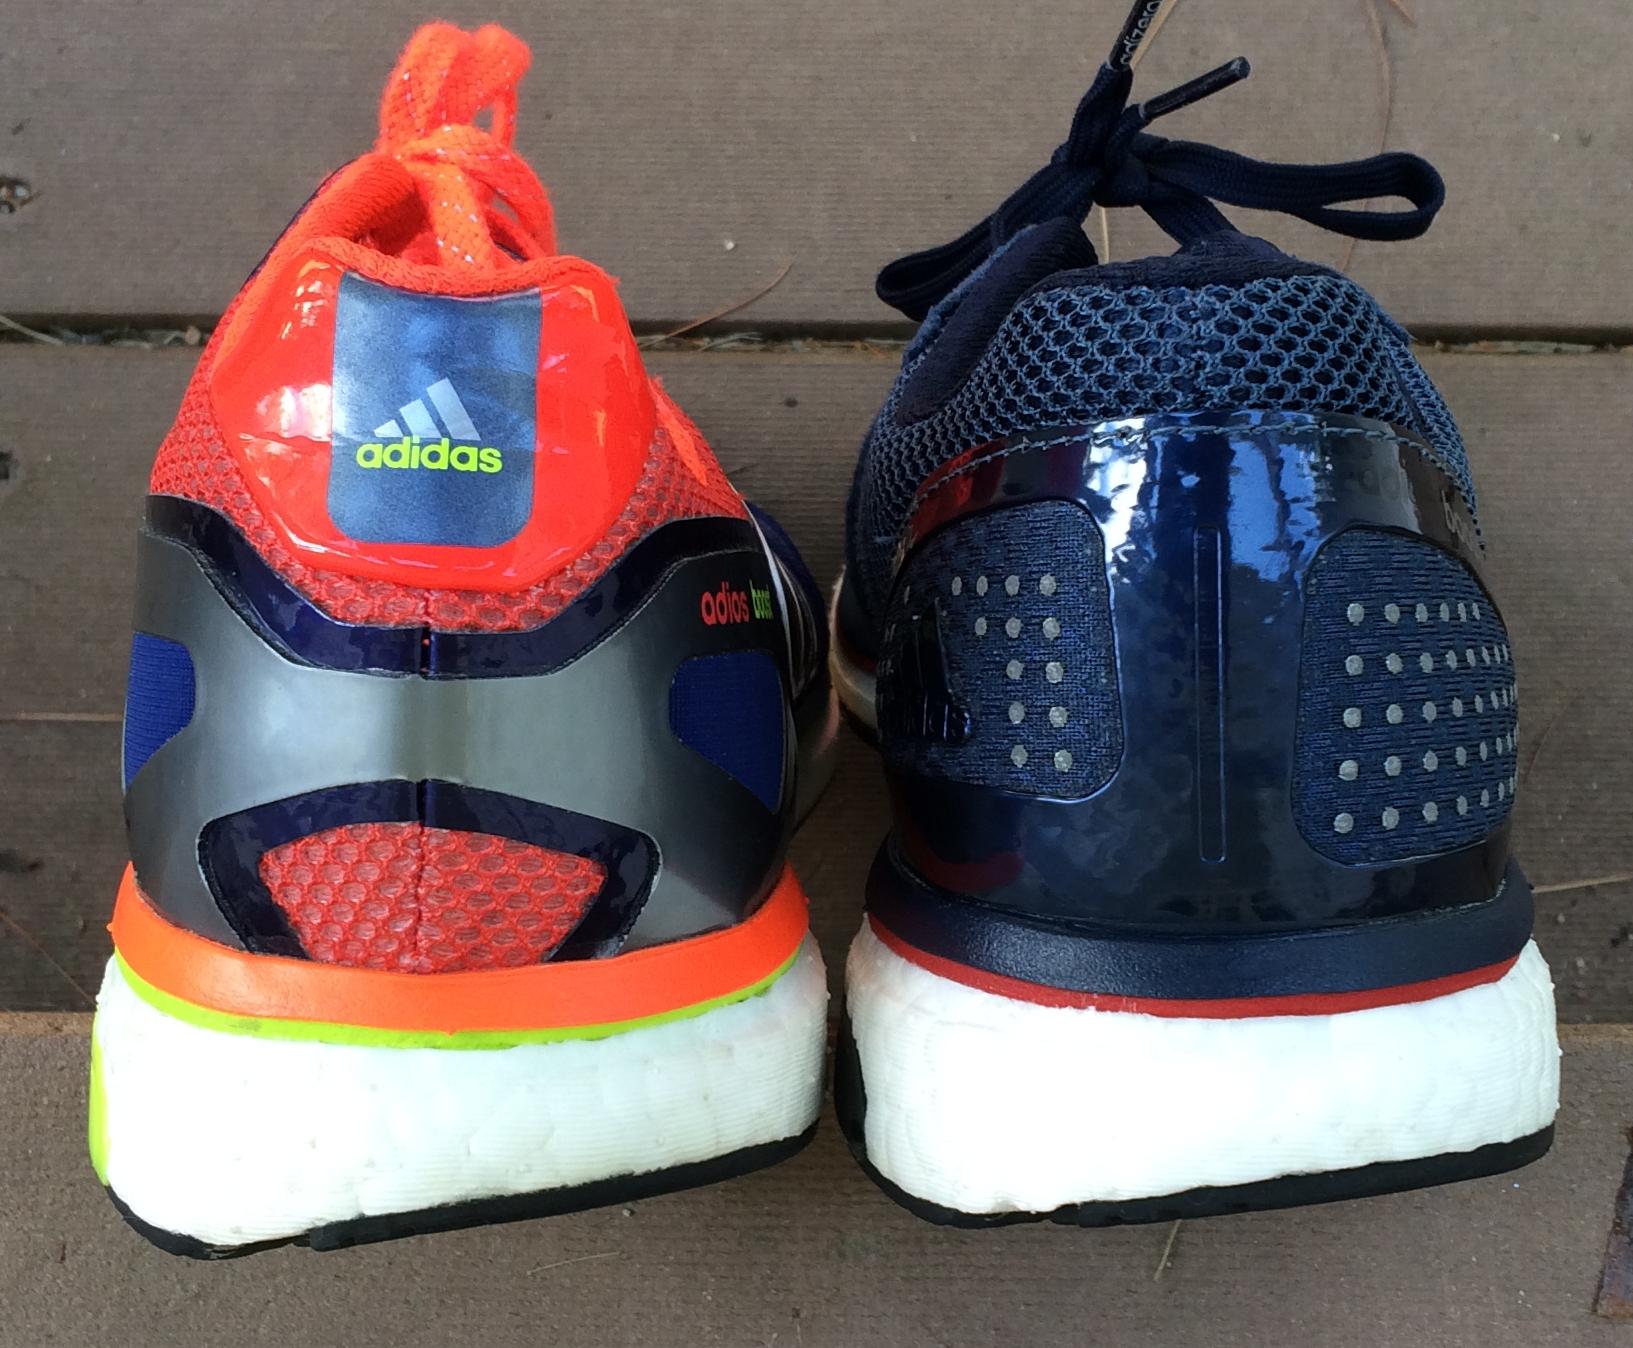 huge selection of 47e4a 3c07a adidas Adios Boost Heel